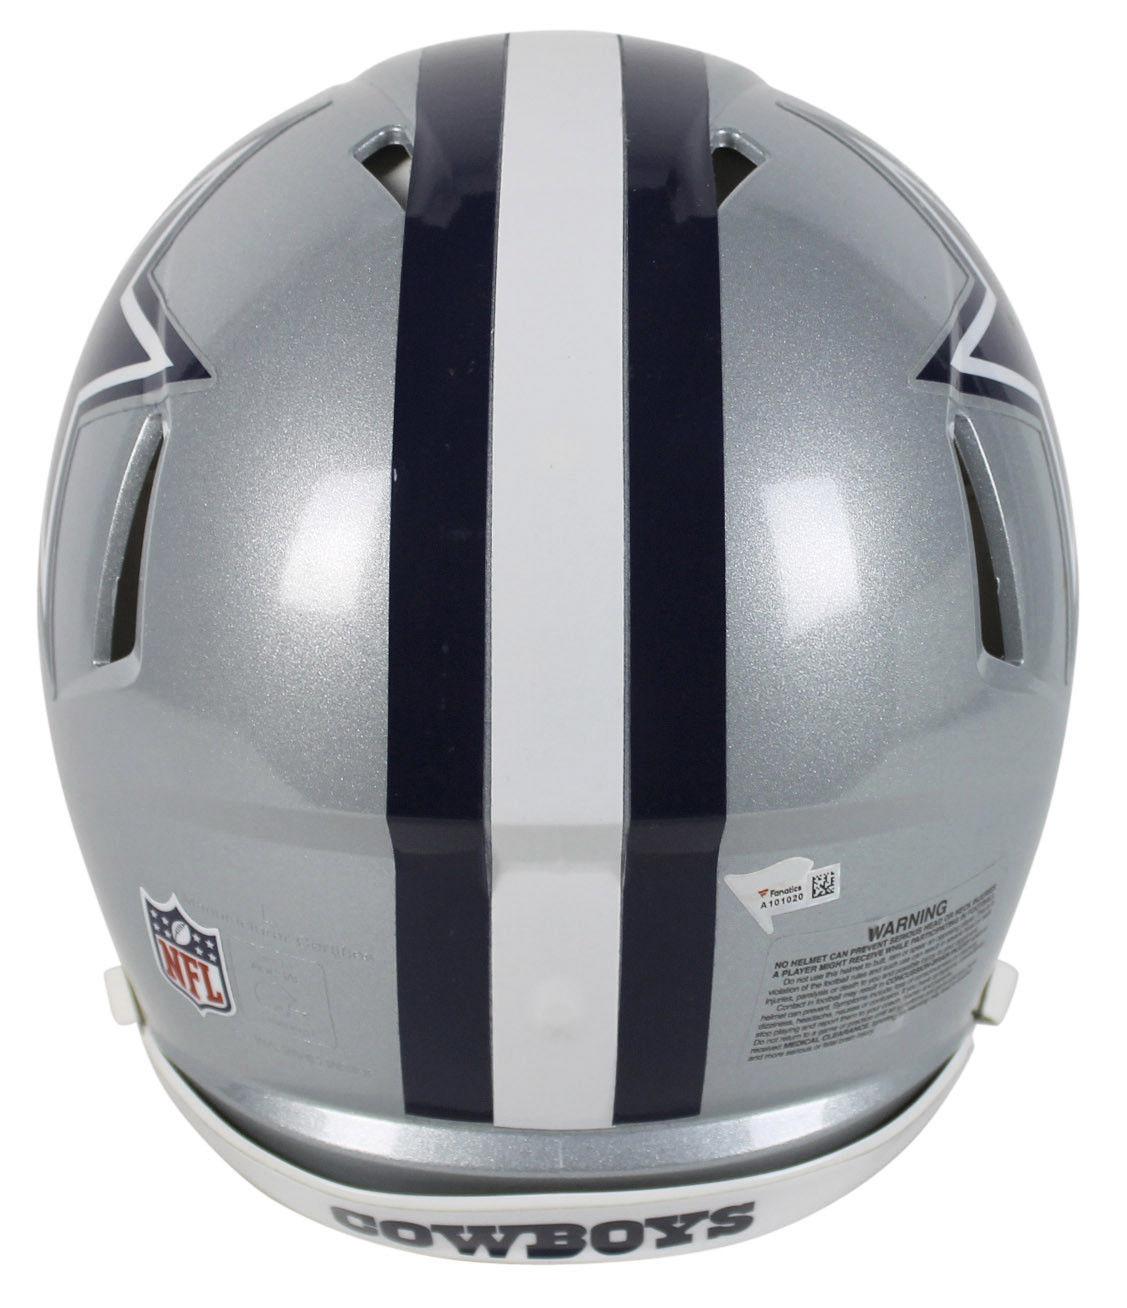 918a136e7a3 ... Dak Prescott & Ezekiel Elliott Dual-Signed Dallas Cowboys Speed Helmet  (Fanatics)